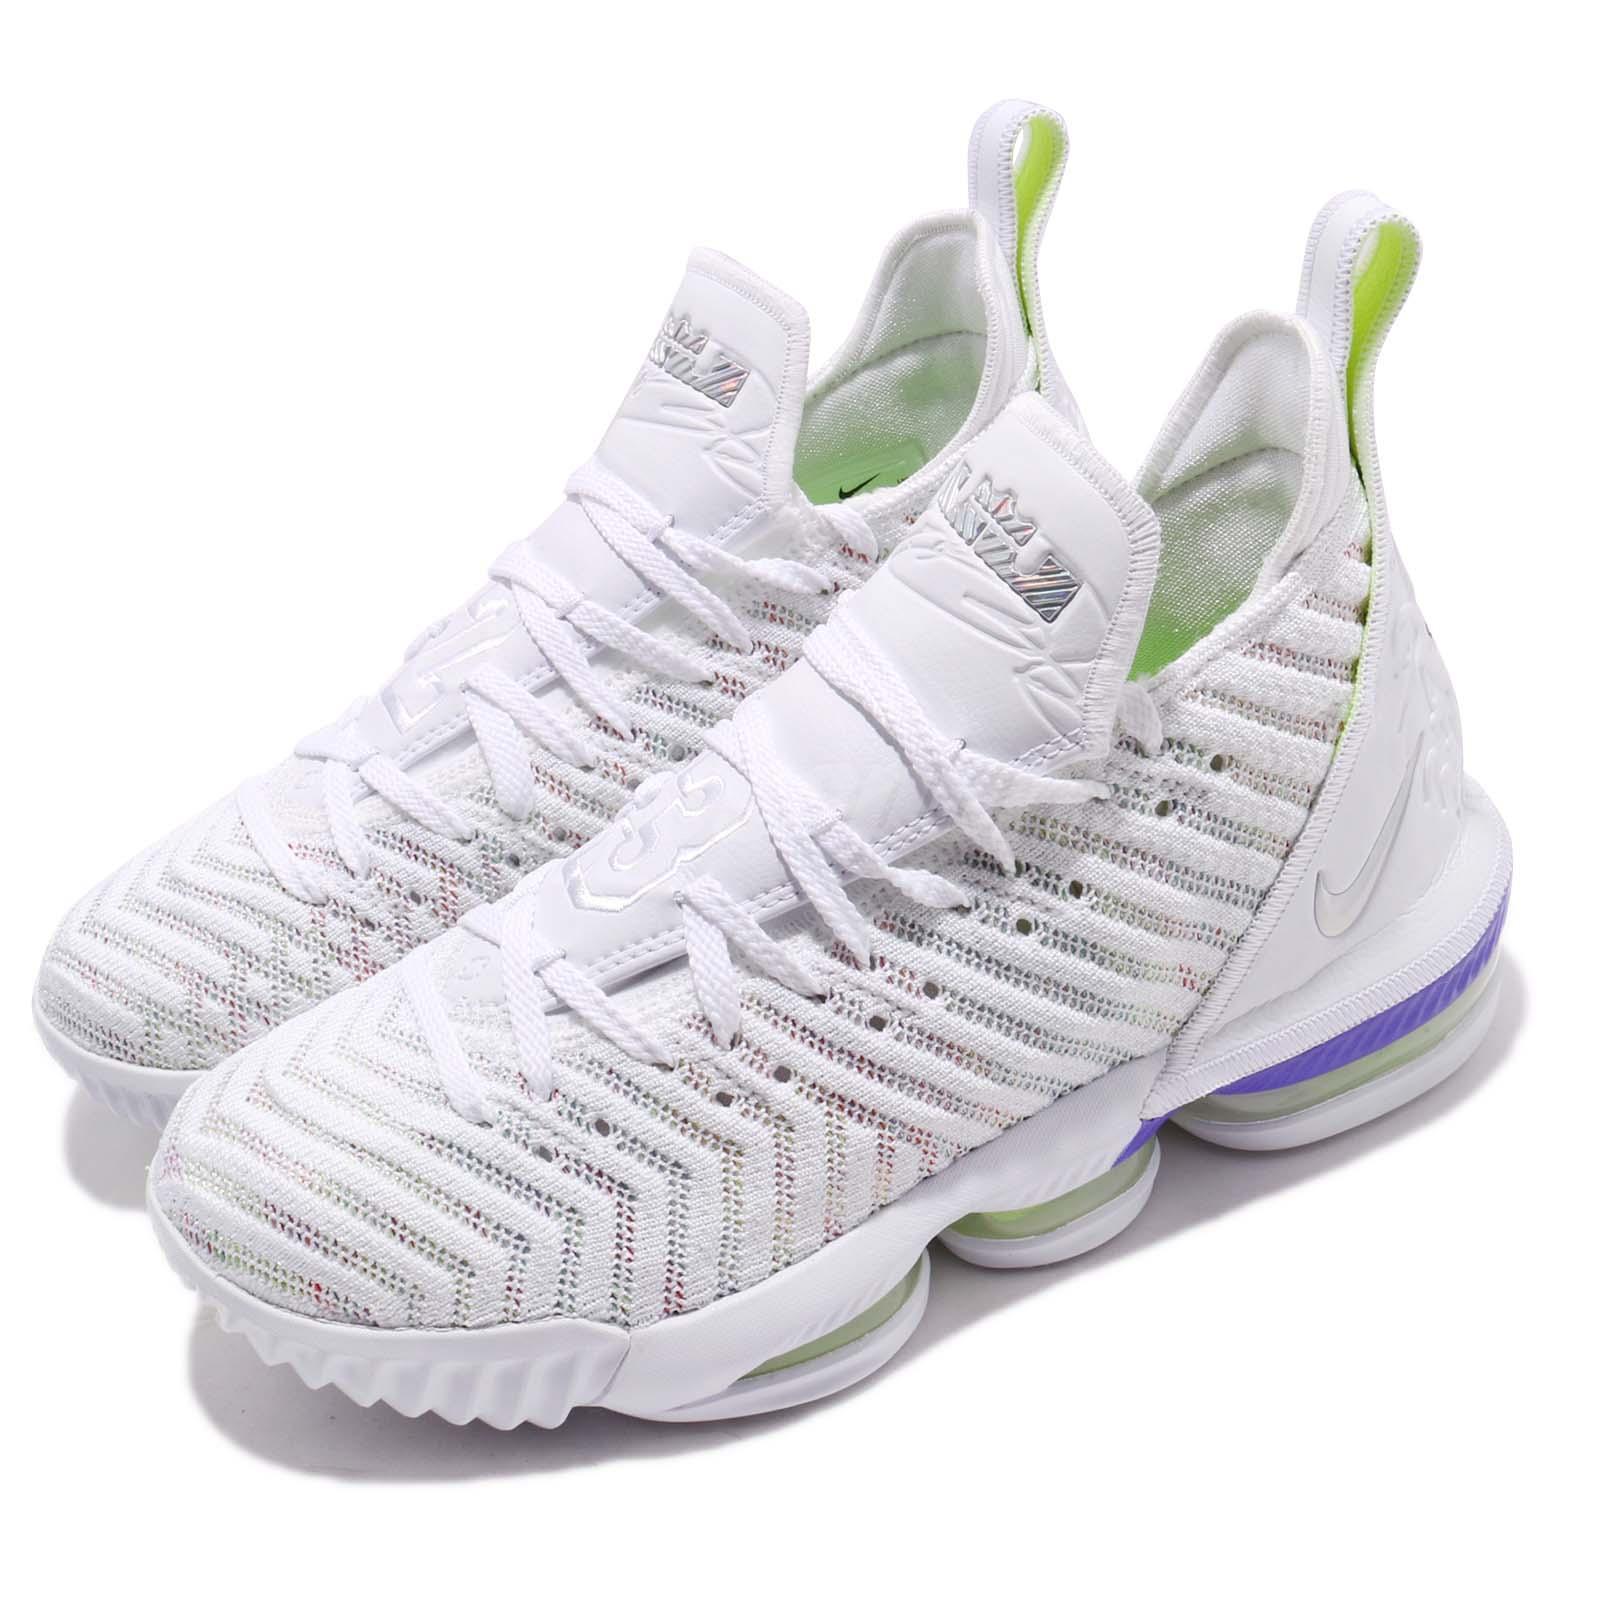 97856cc52d9 Details about Nike Lebron XVI EP 16 Buzz Lightyear James White Men  Basketball Shoes AO2595-102